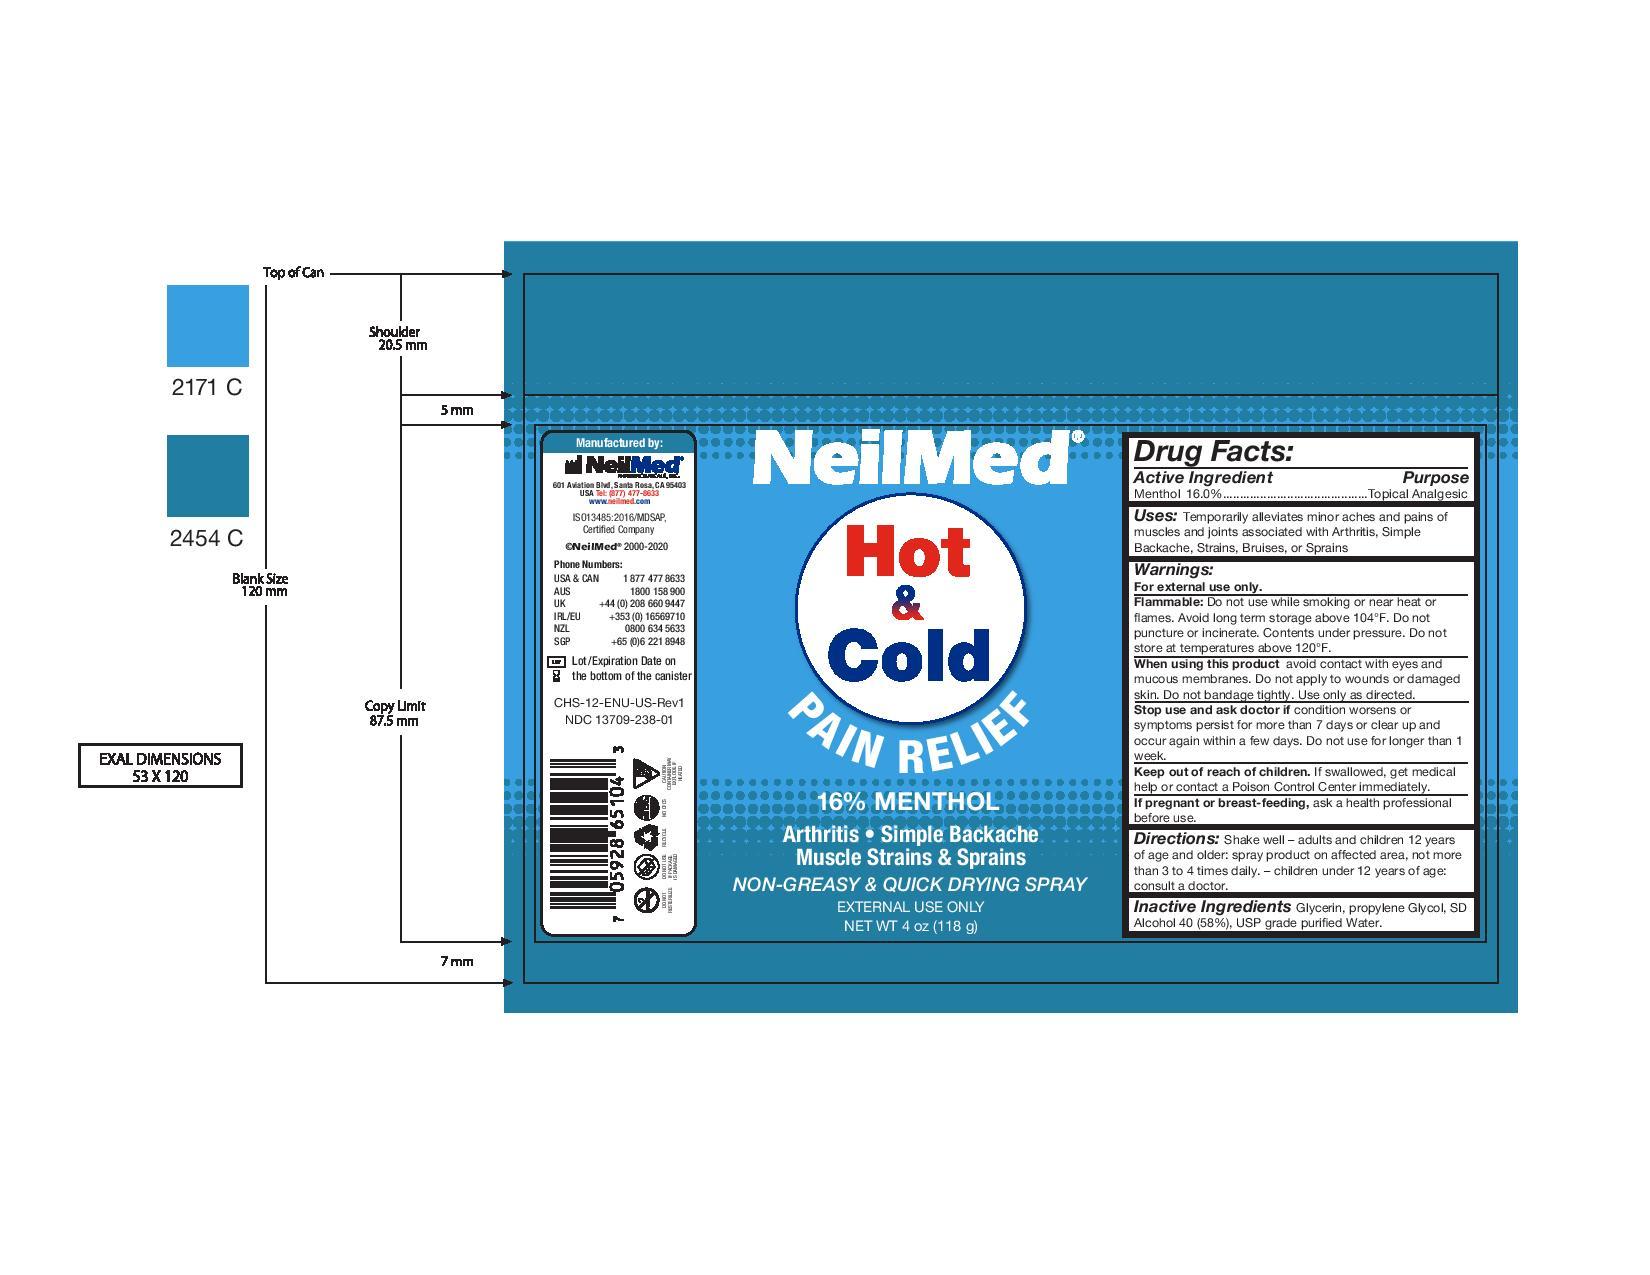 NeilMed Hot & Cold Pain Relief Spray